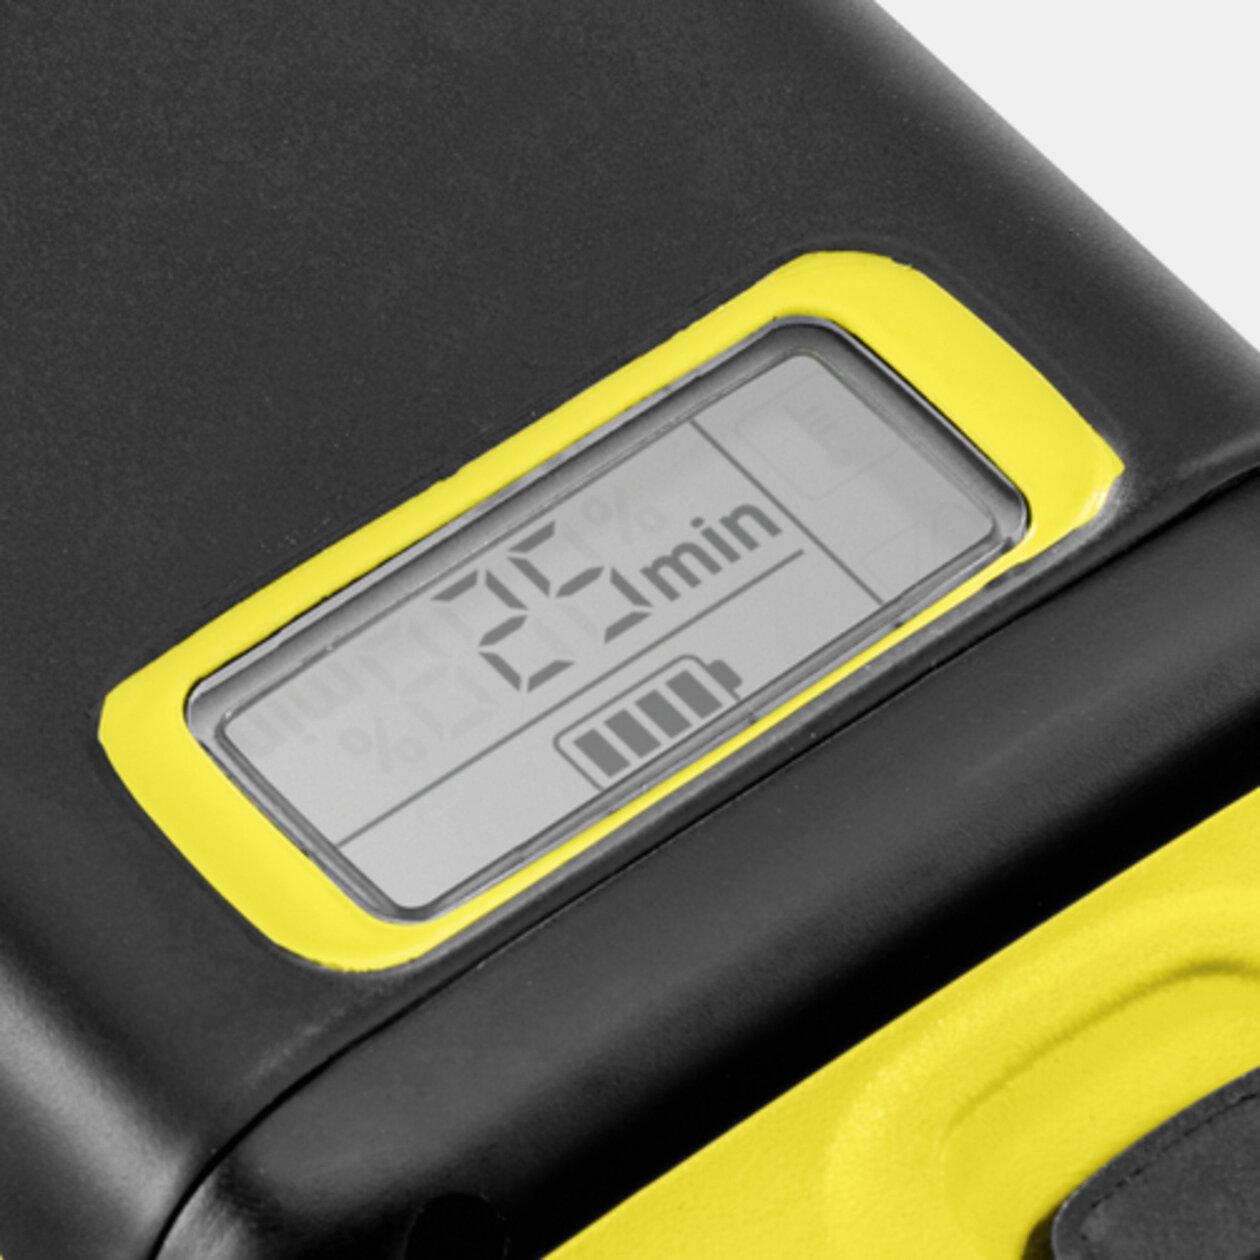 Starter Kit Battery Power 36/25: Innovative Real Time Technology